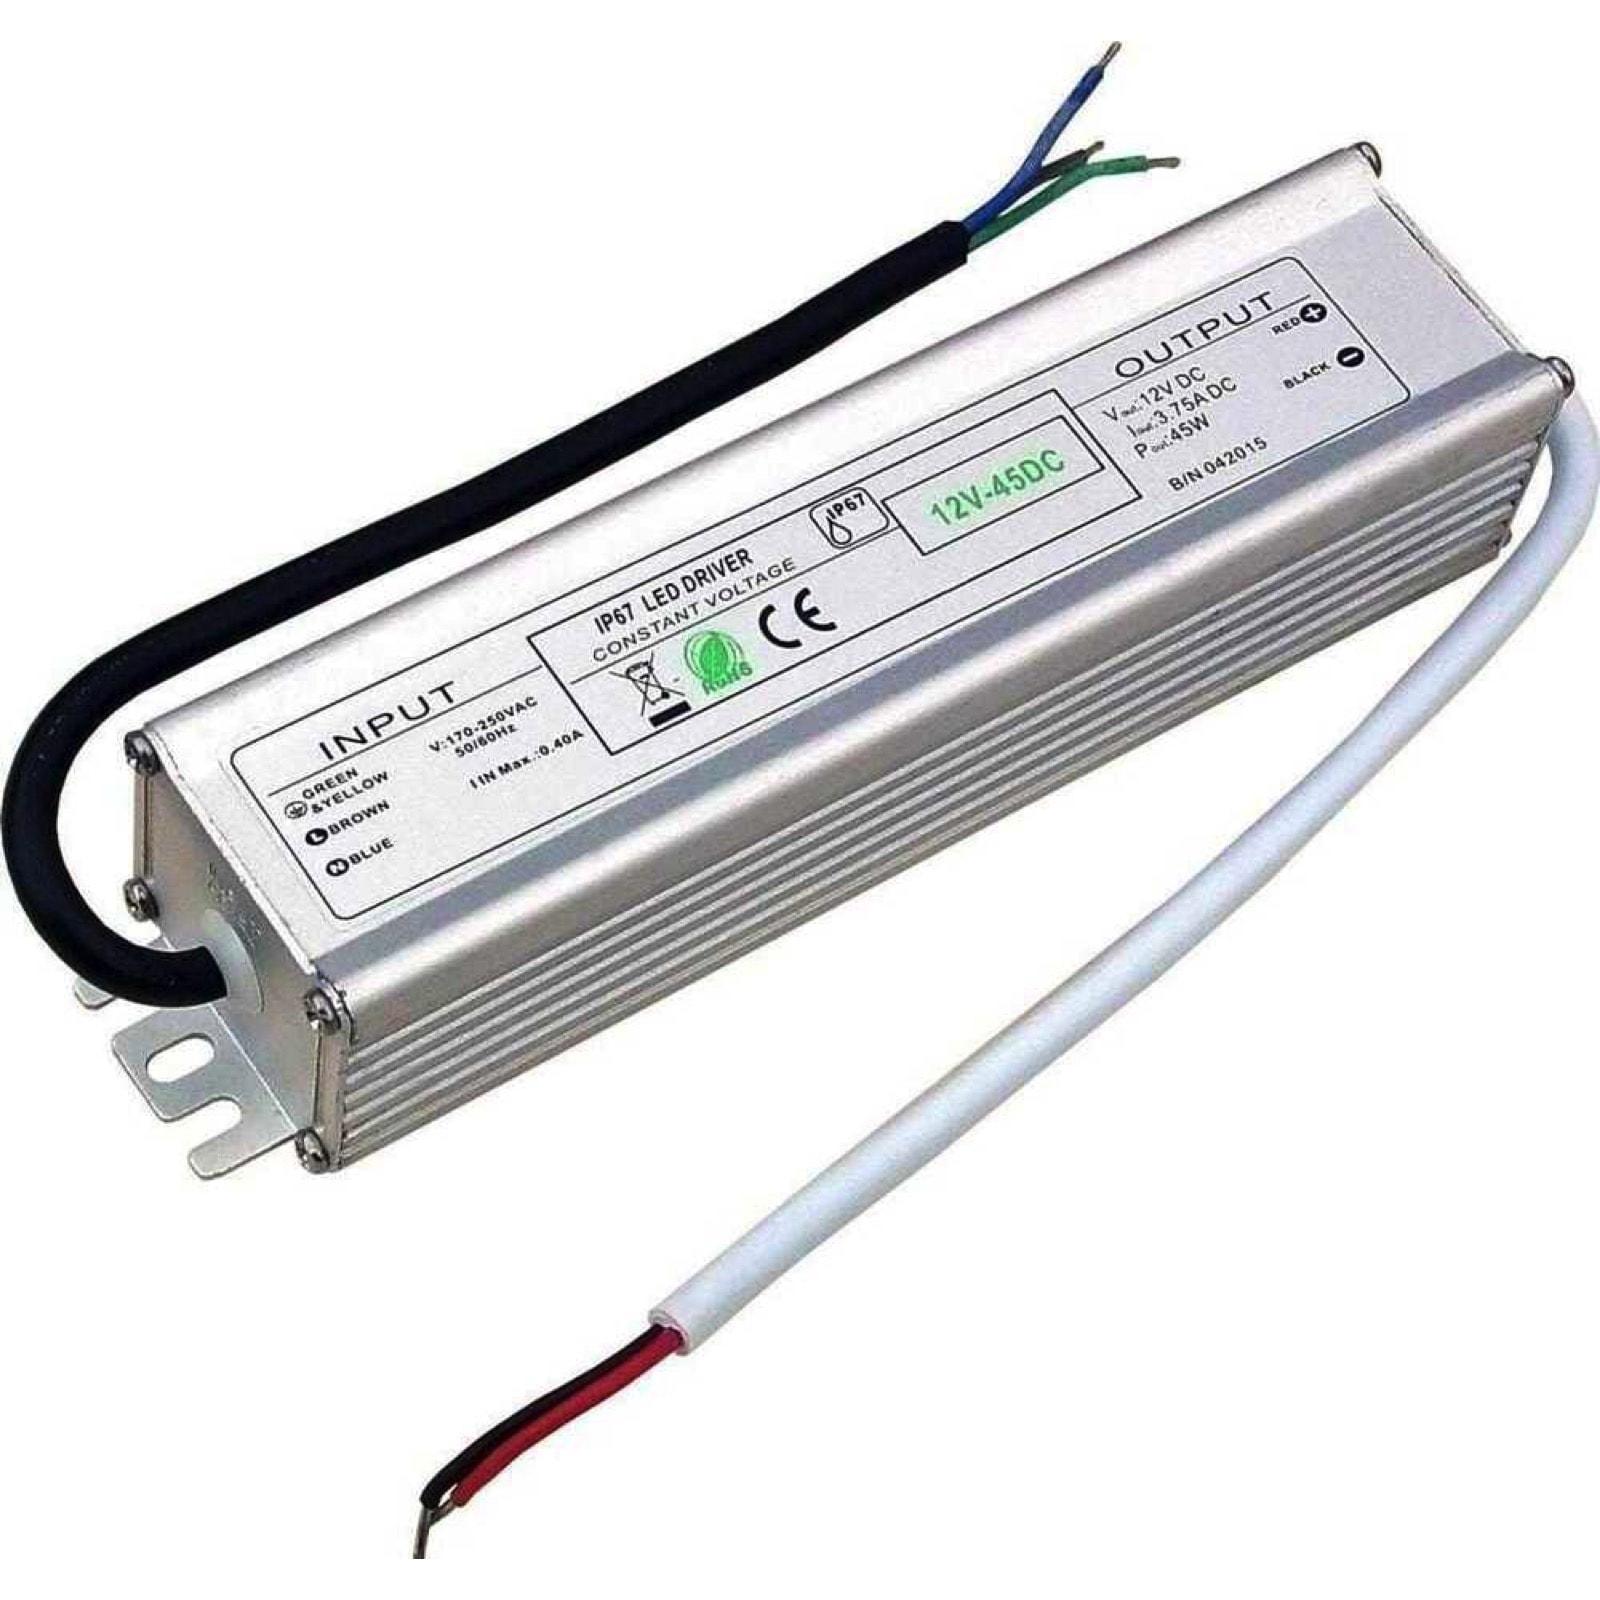 DELTECH LED POWER WINDOWS 8 X64 DRIVER DOWNLOAD